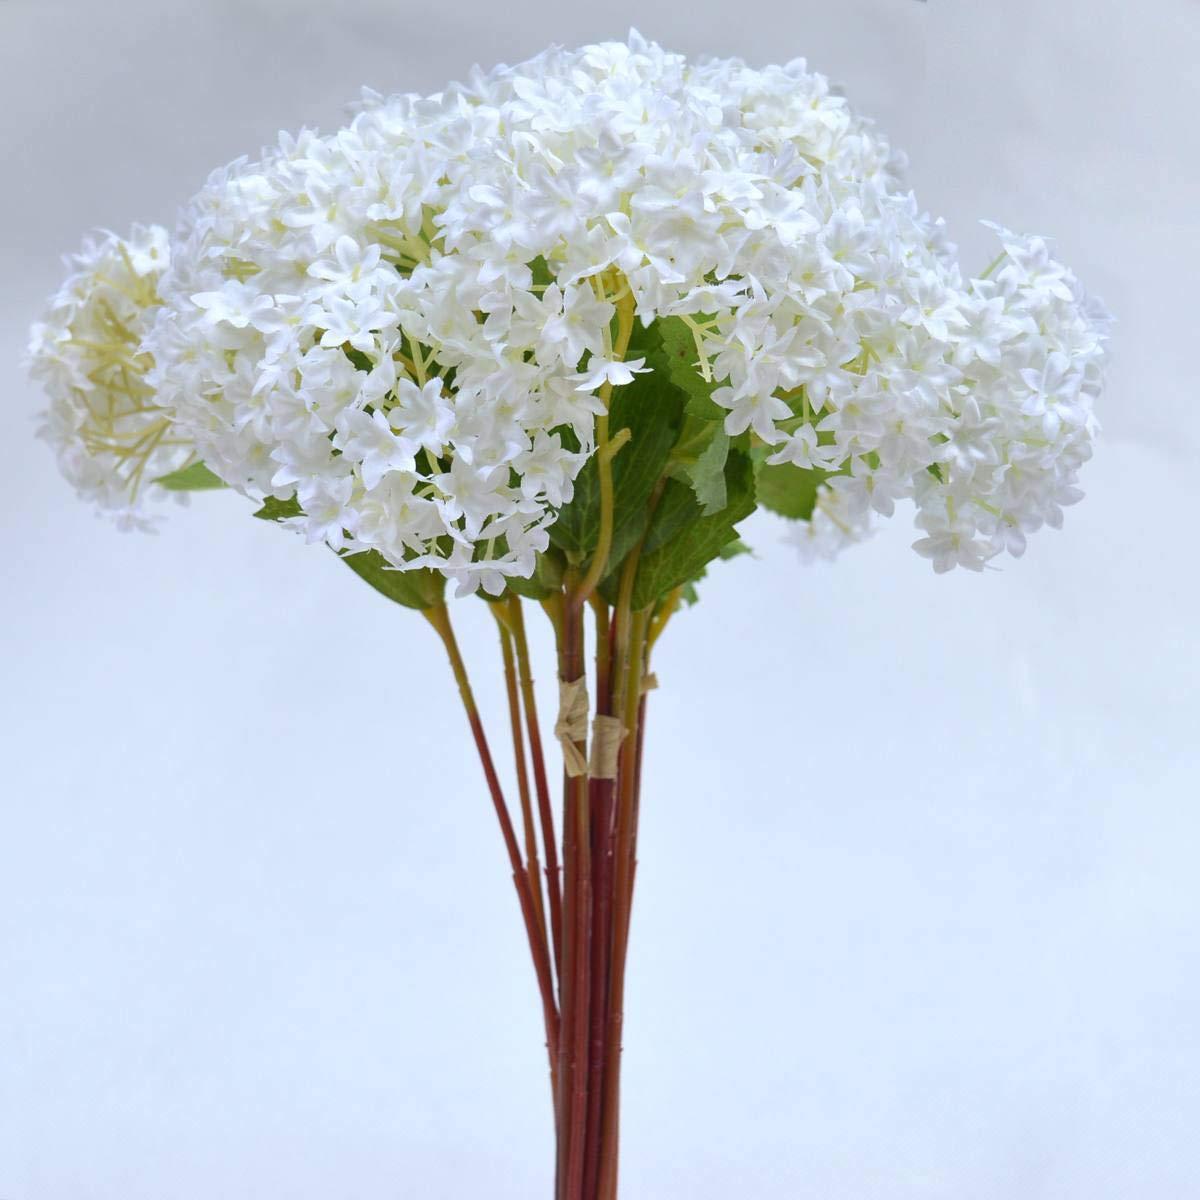 Fatcolo mini artificial silk flower bouquet white 12 piece amazon fatcolo mini artificial silk flower bouquet white 12 piece home kitchen izmirmasajfo